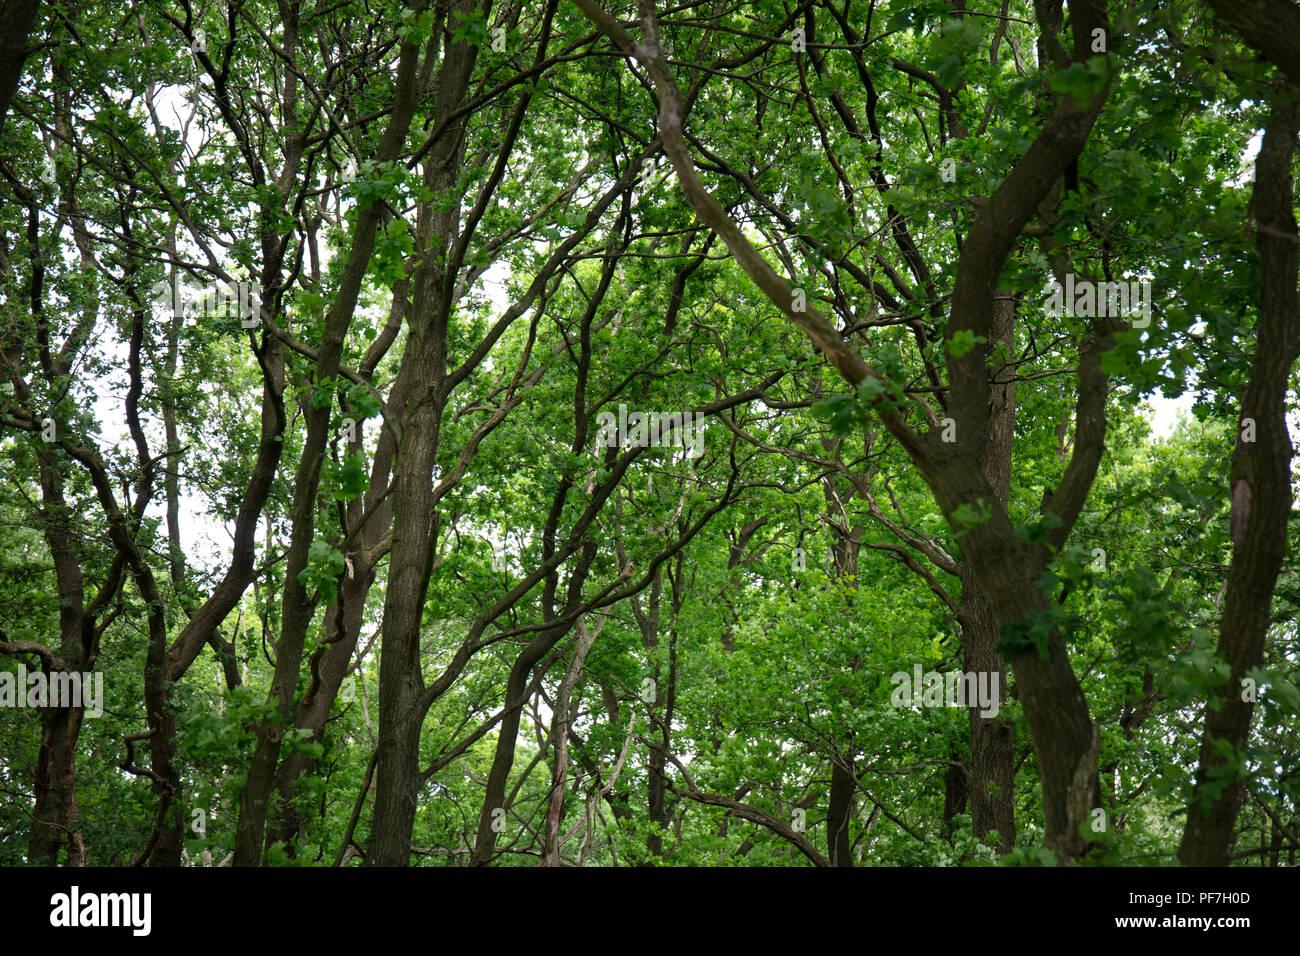 Forrest - Stock Image